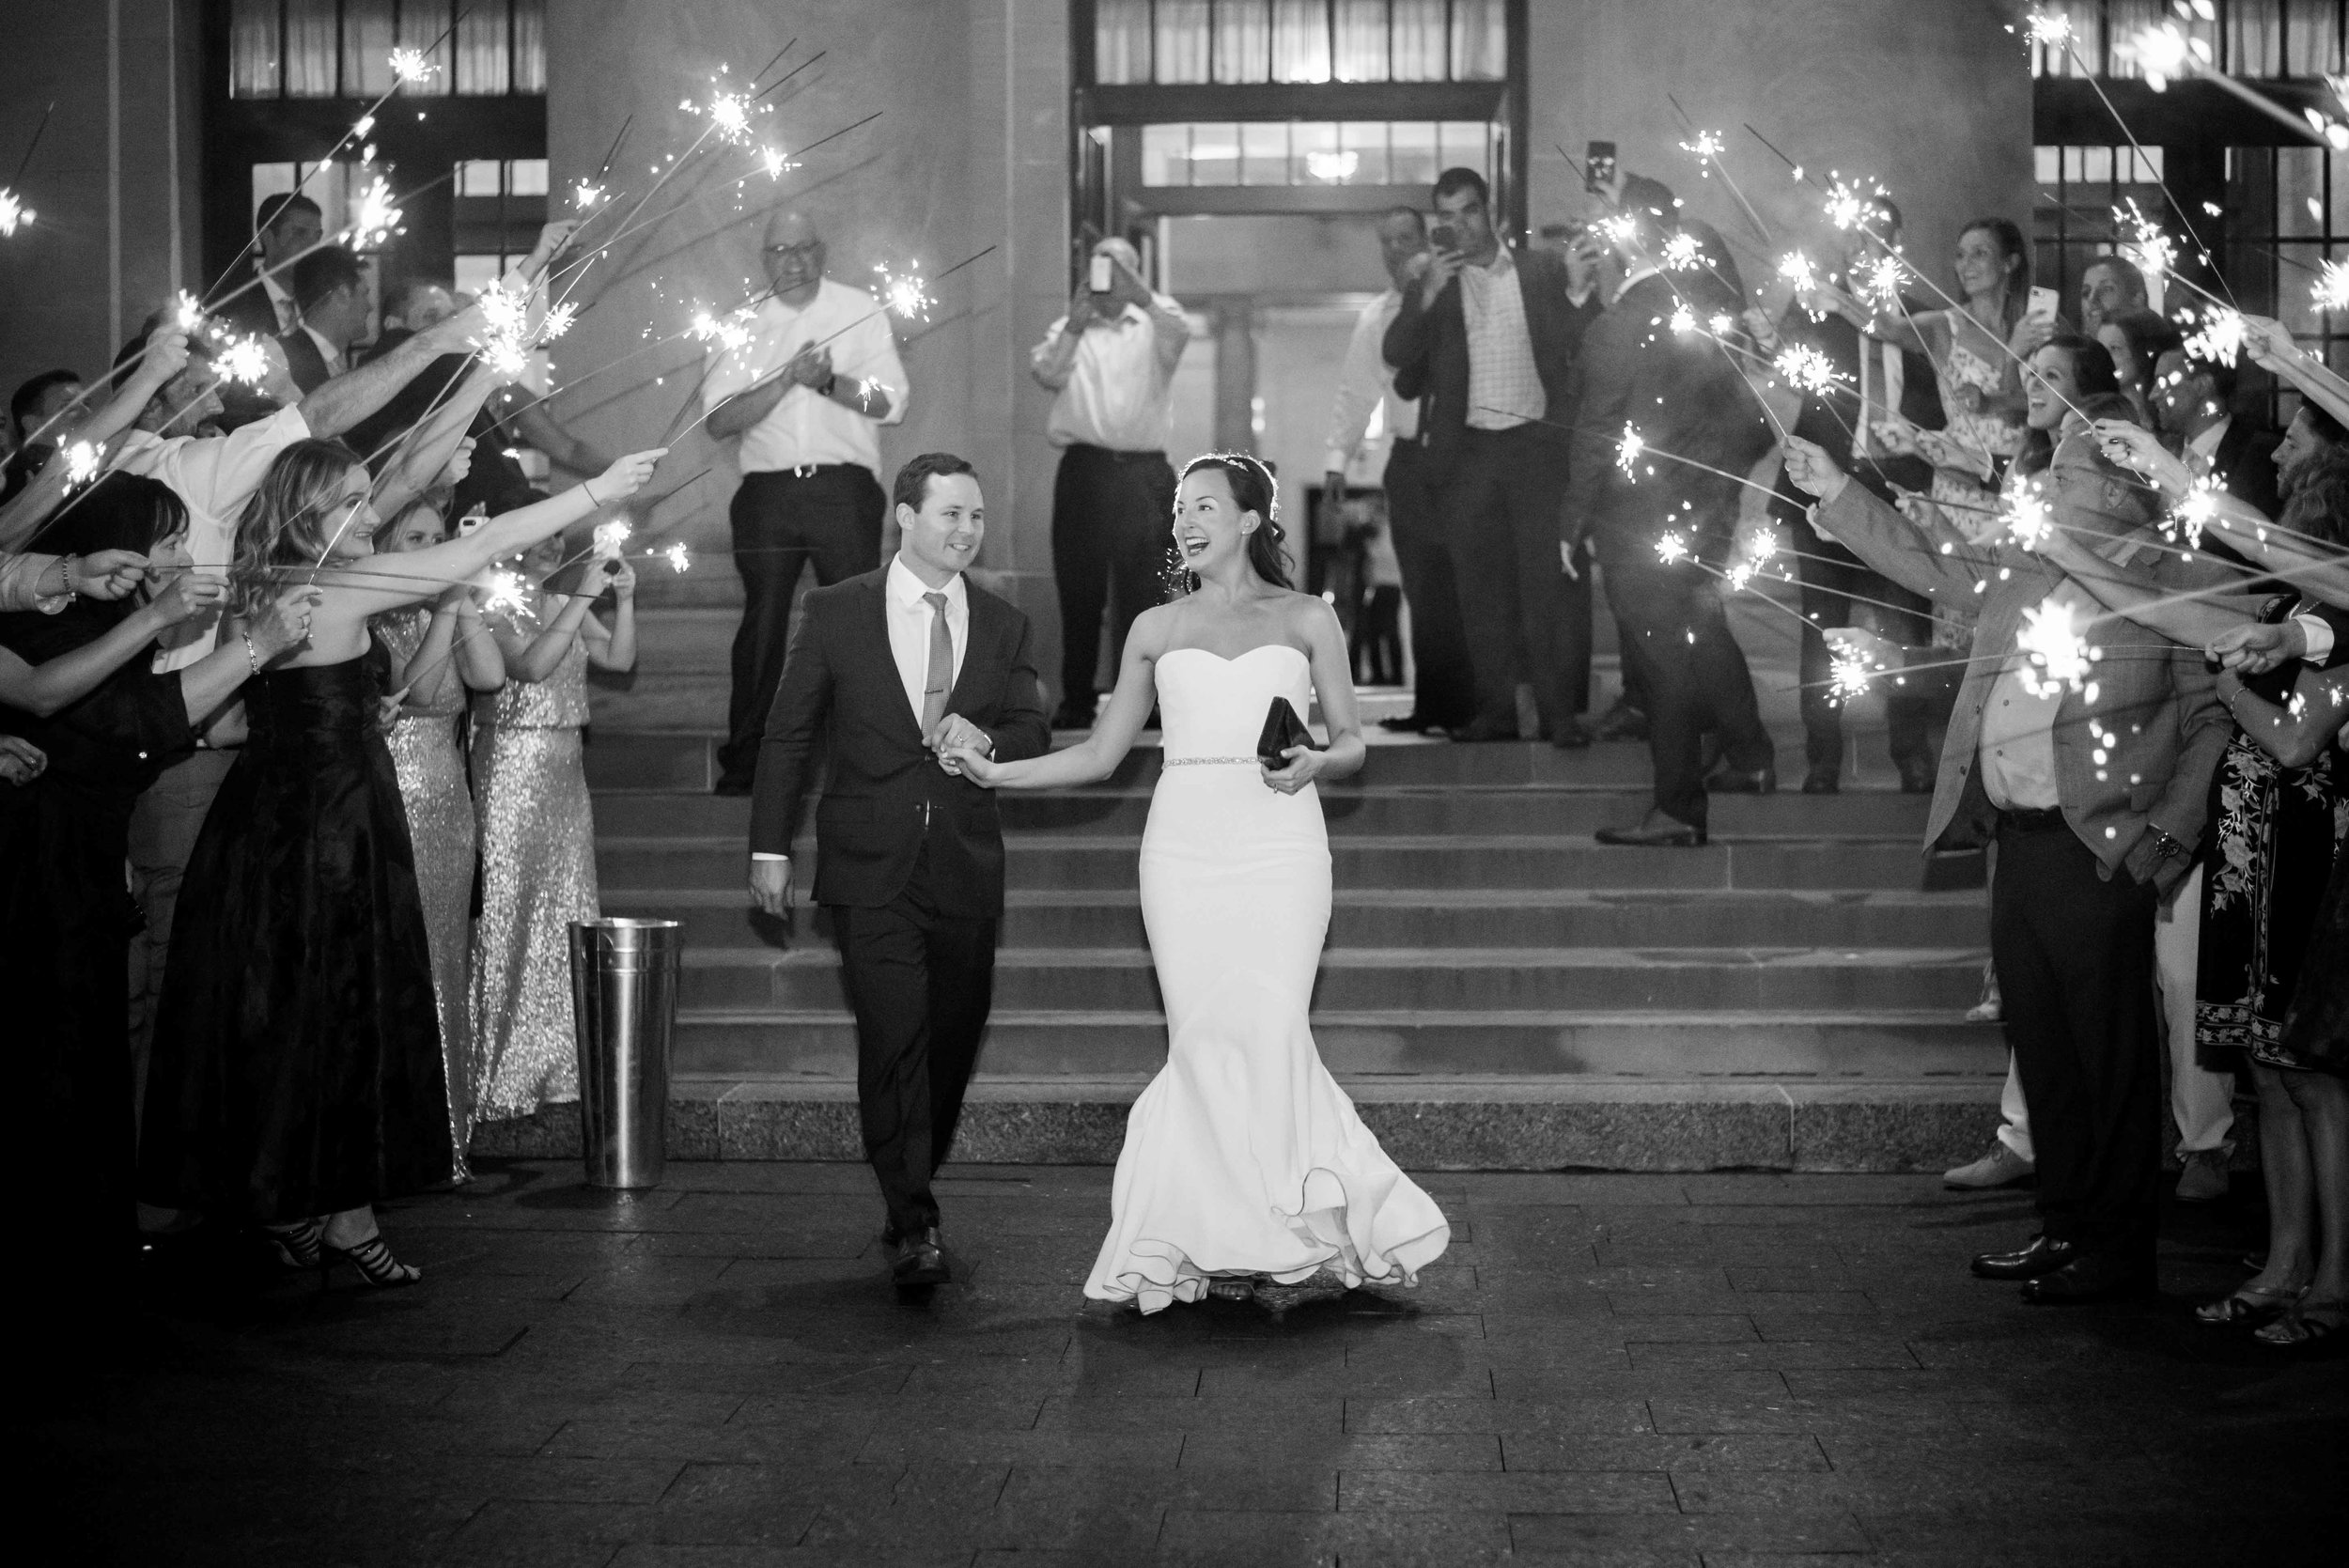 nelson-atkins-wedding-93.jpg